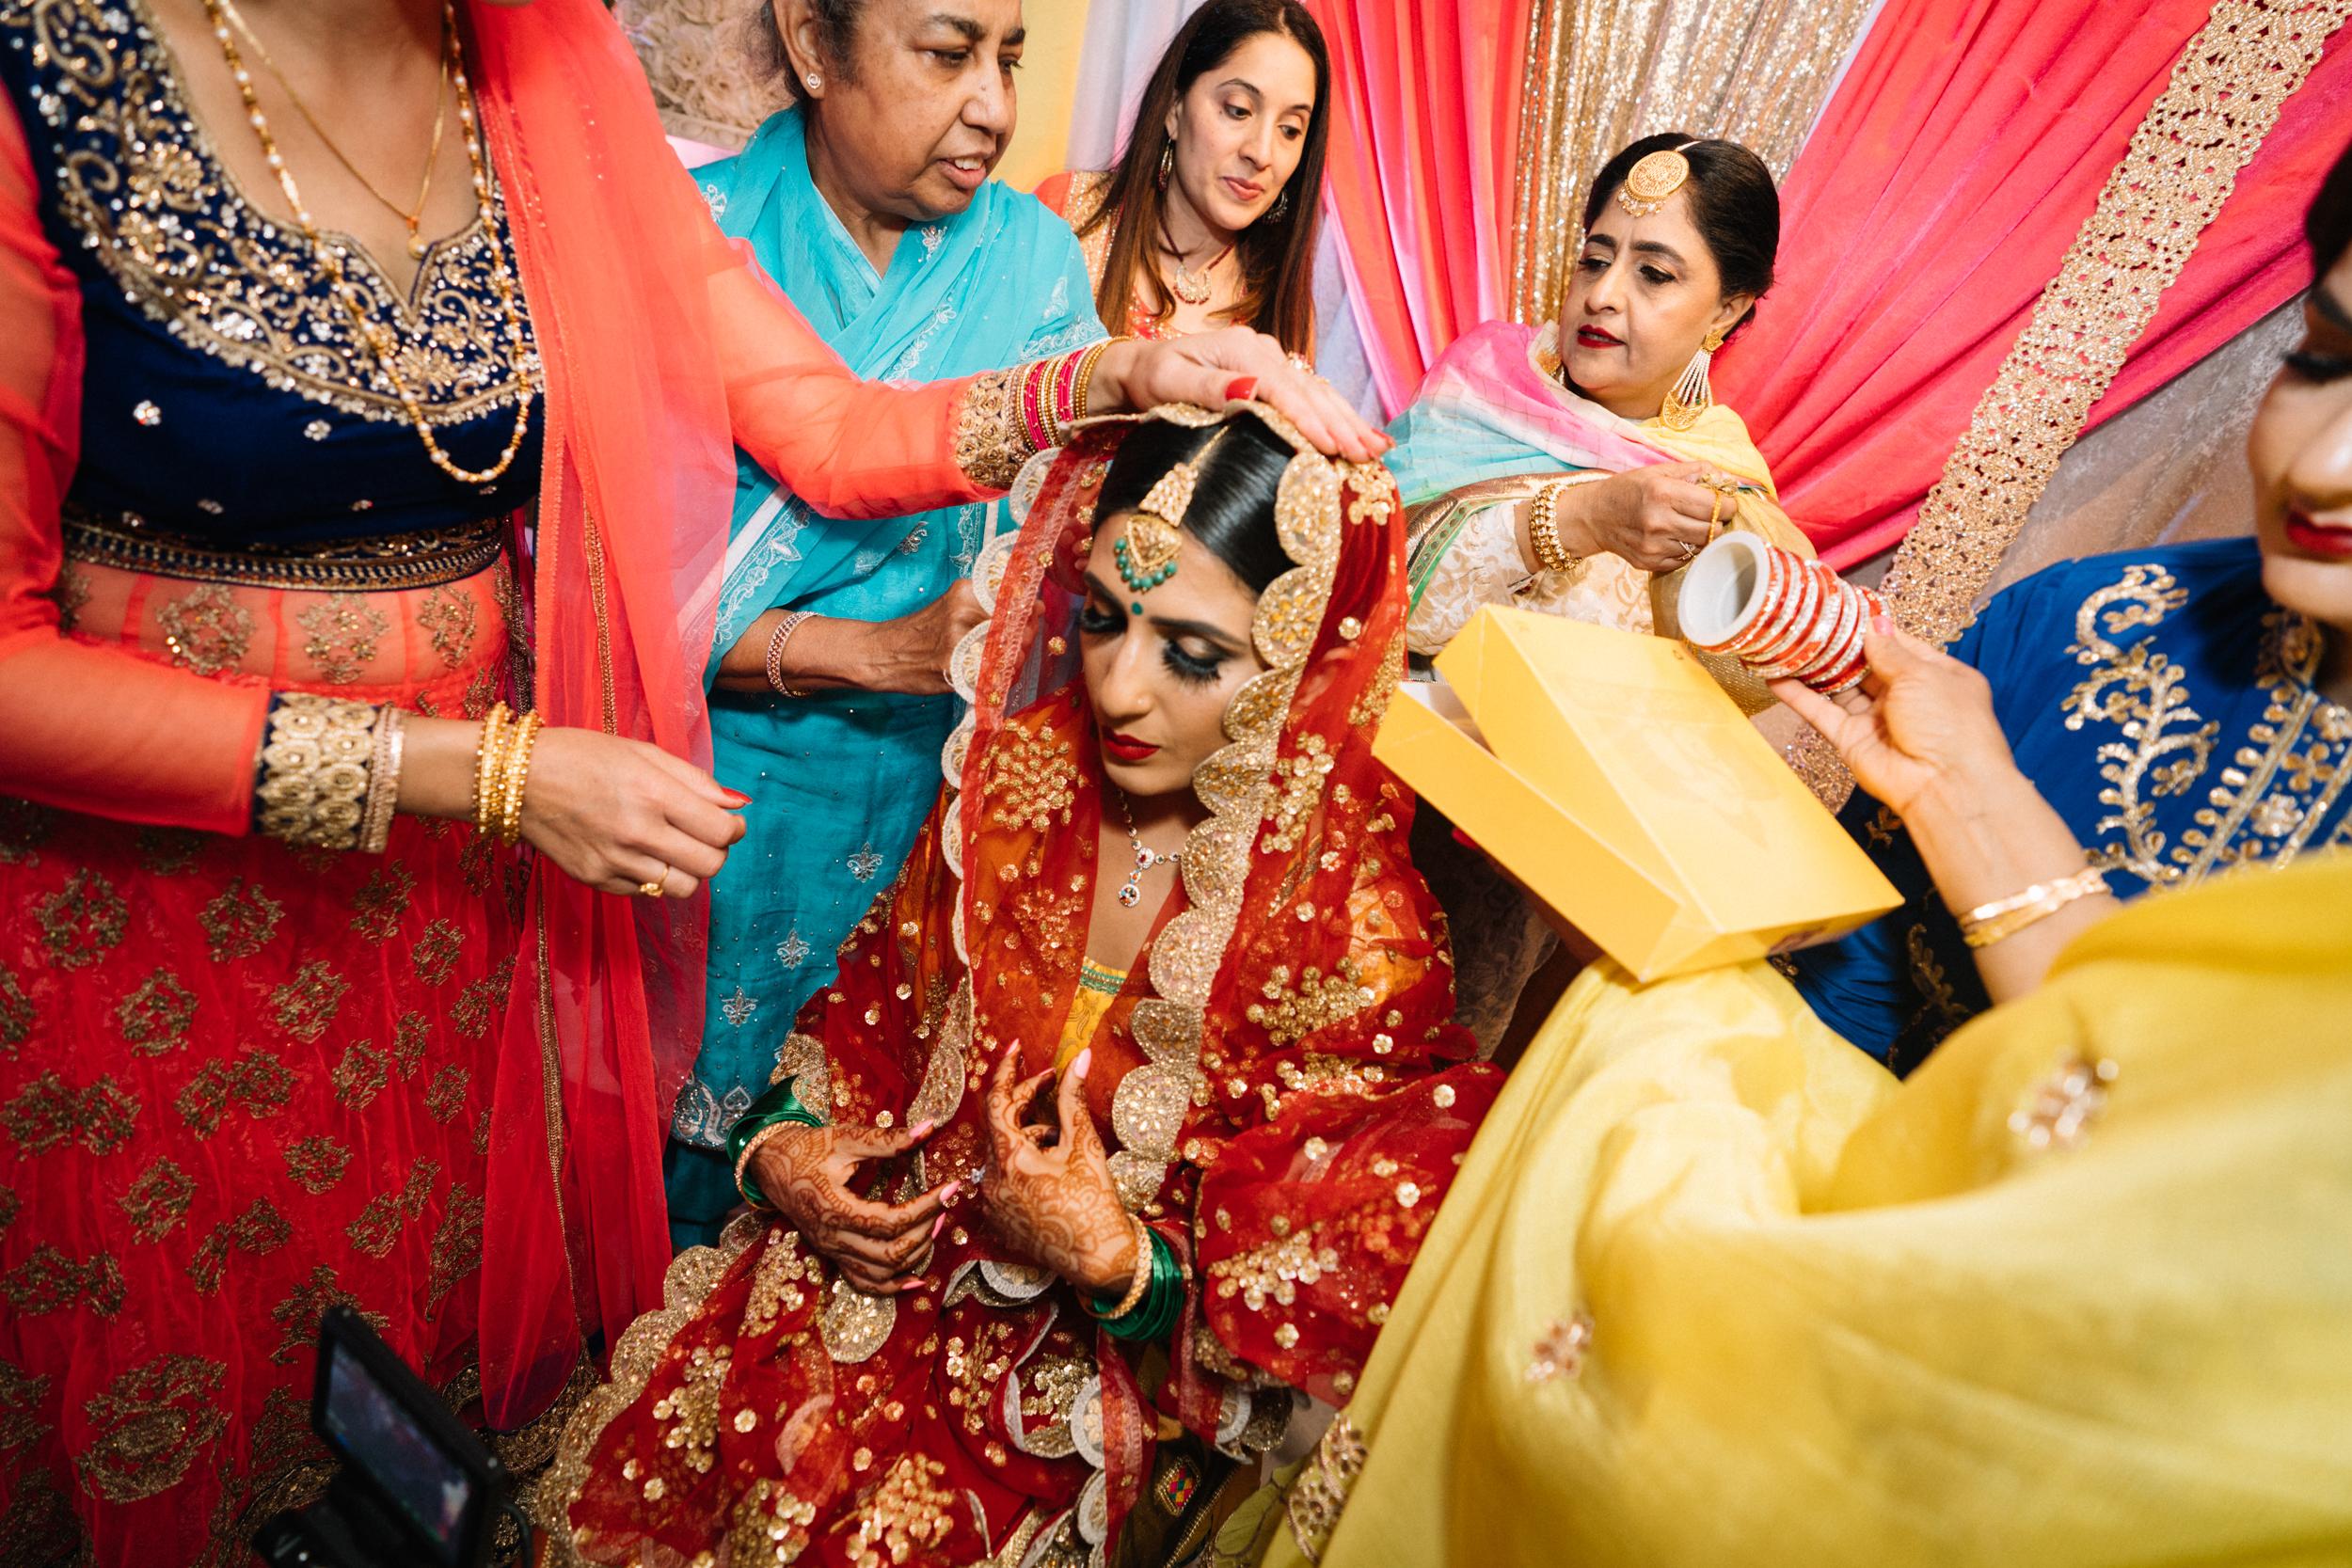 Indian Wedding Photography & Videography [UltraHD